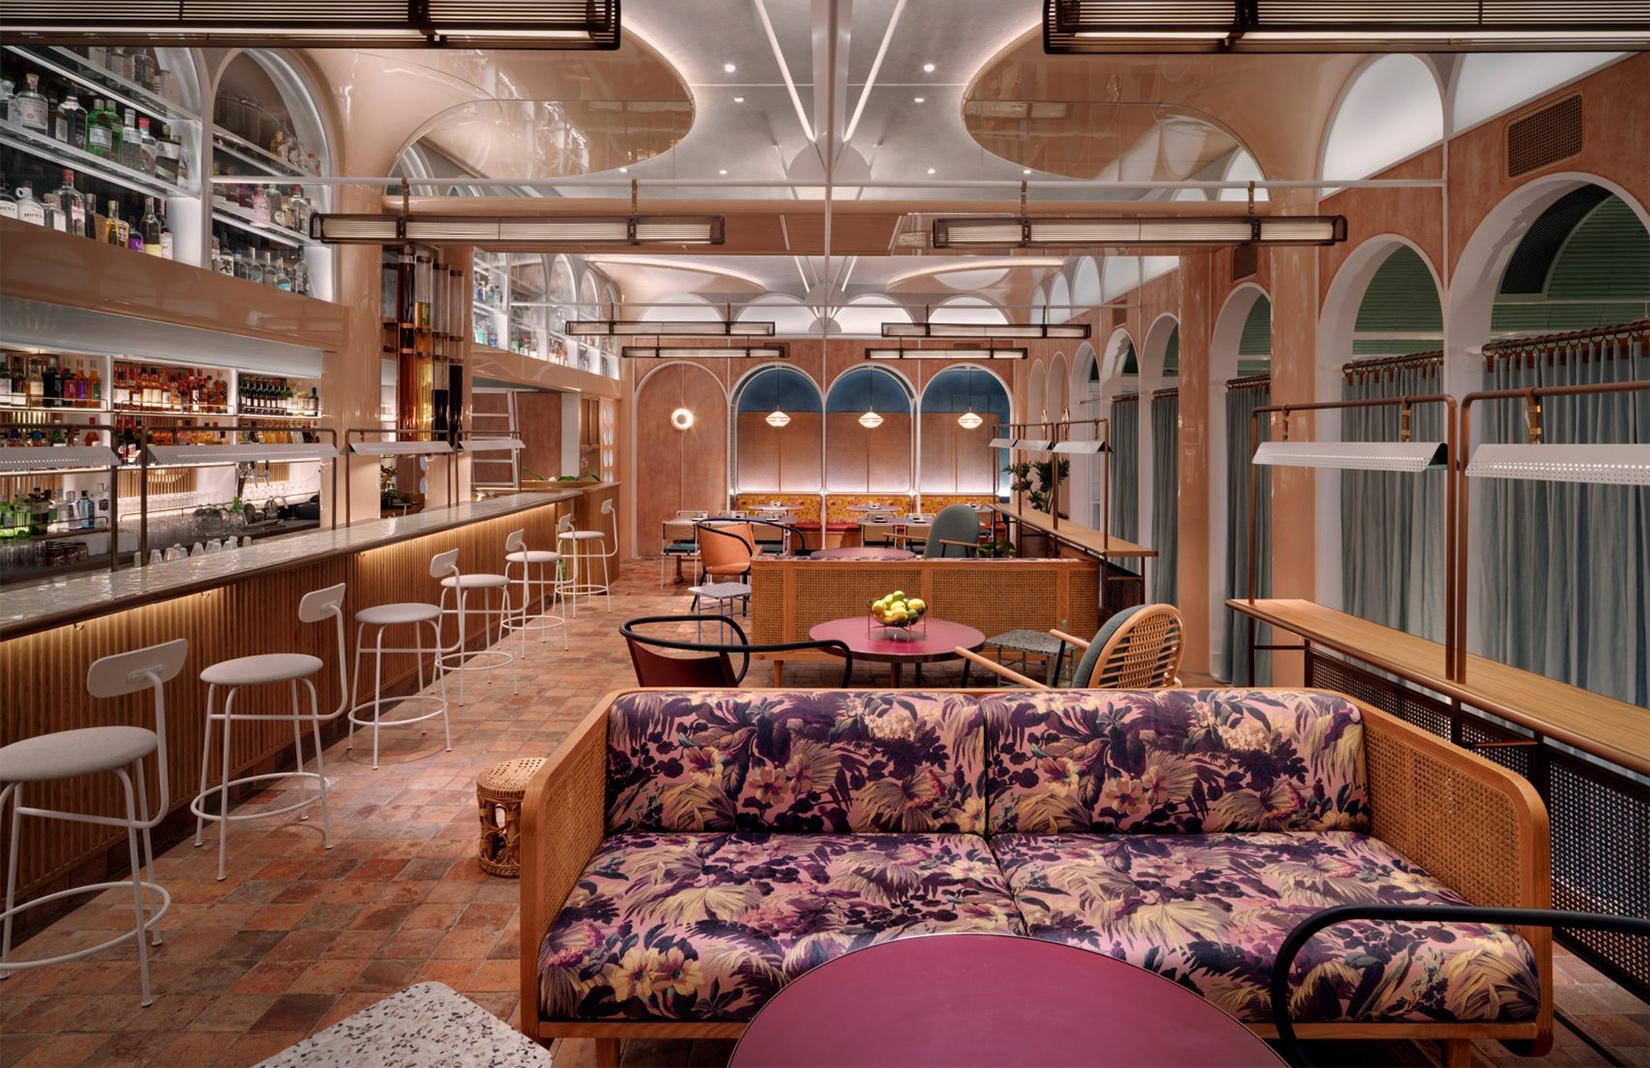 Interiors of Hong Kong dim sum canteen John Anthony